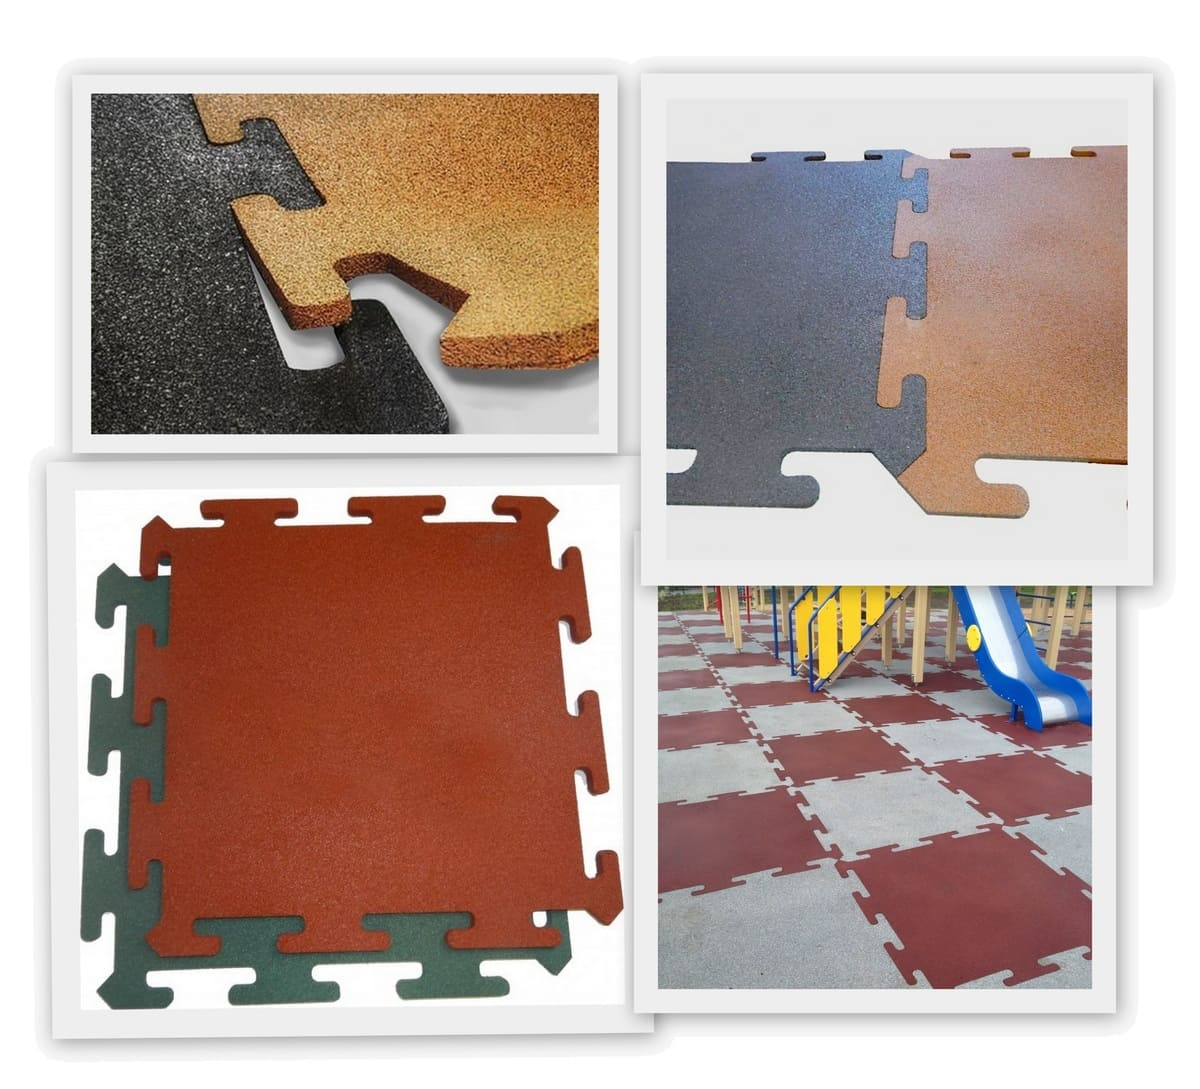 Фото покрытия ласточкин хвост (Puzzle)